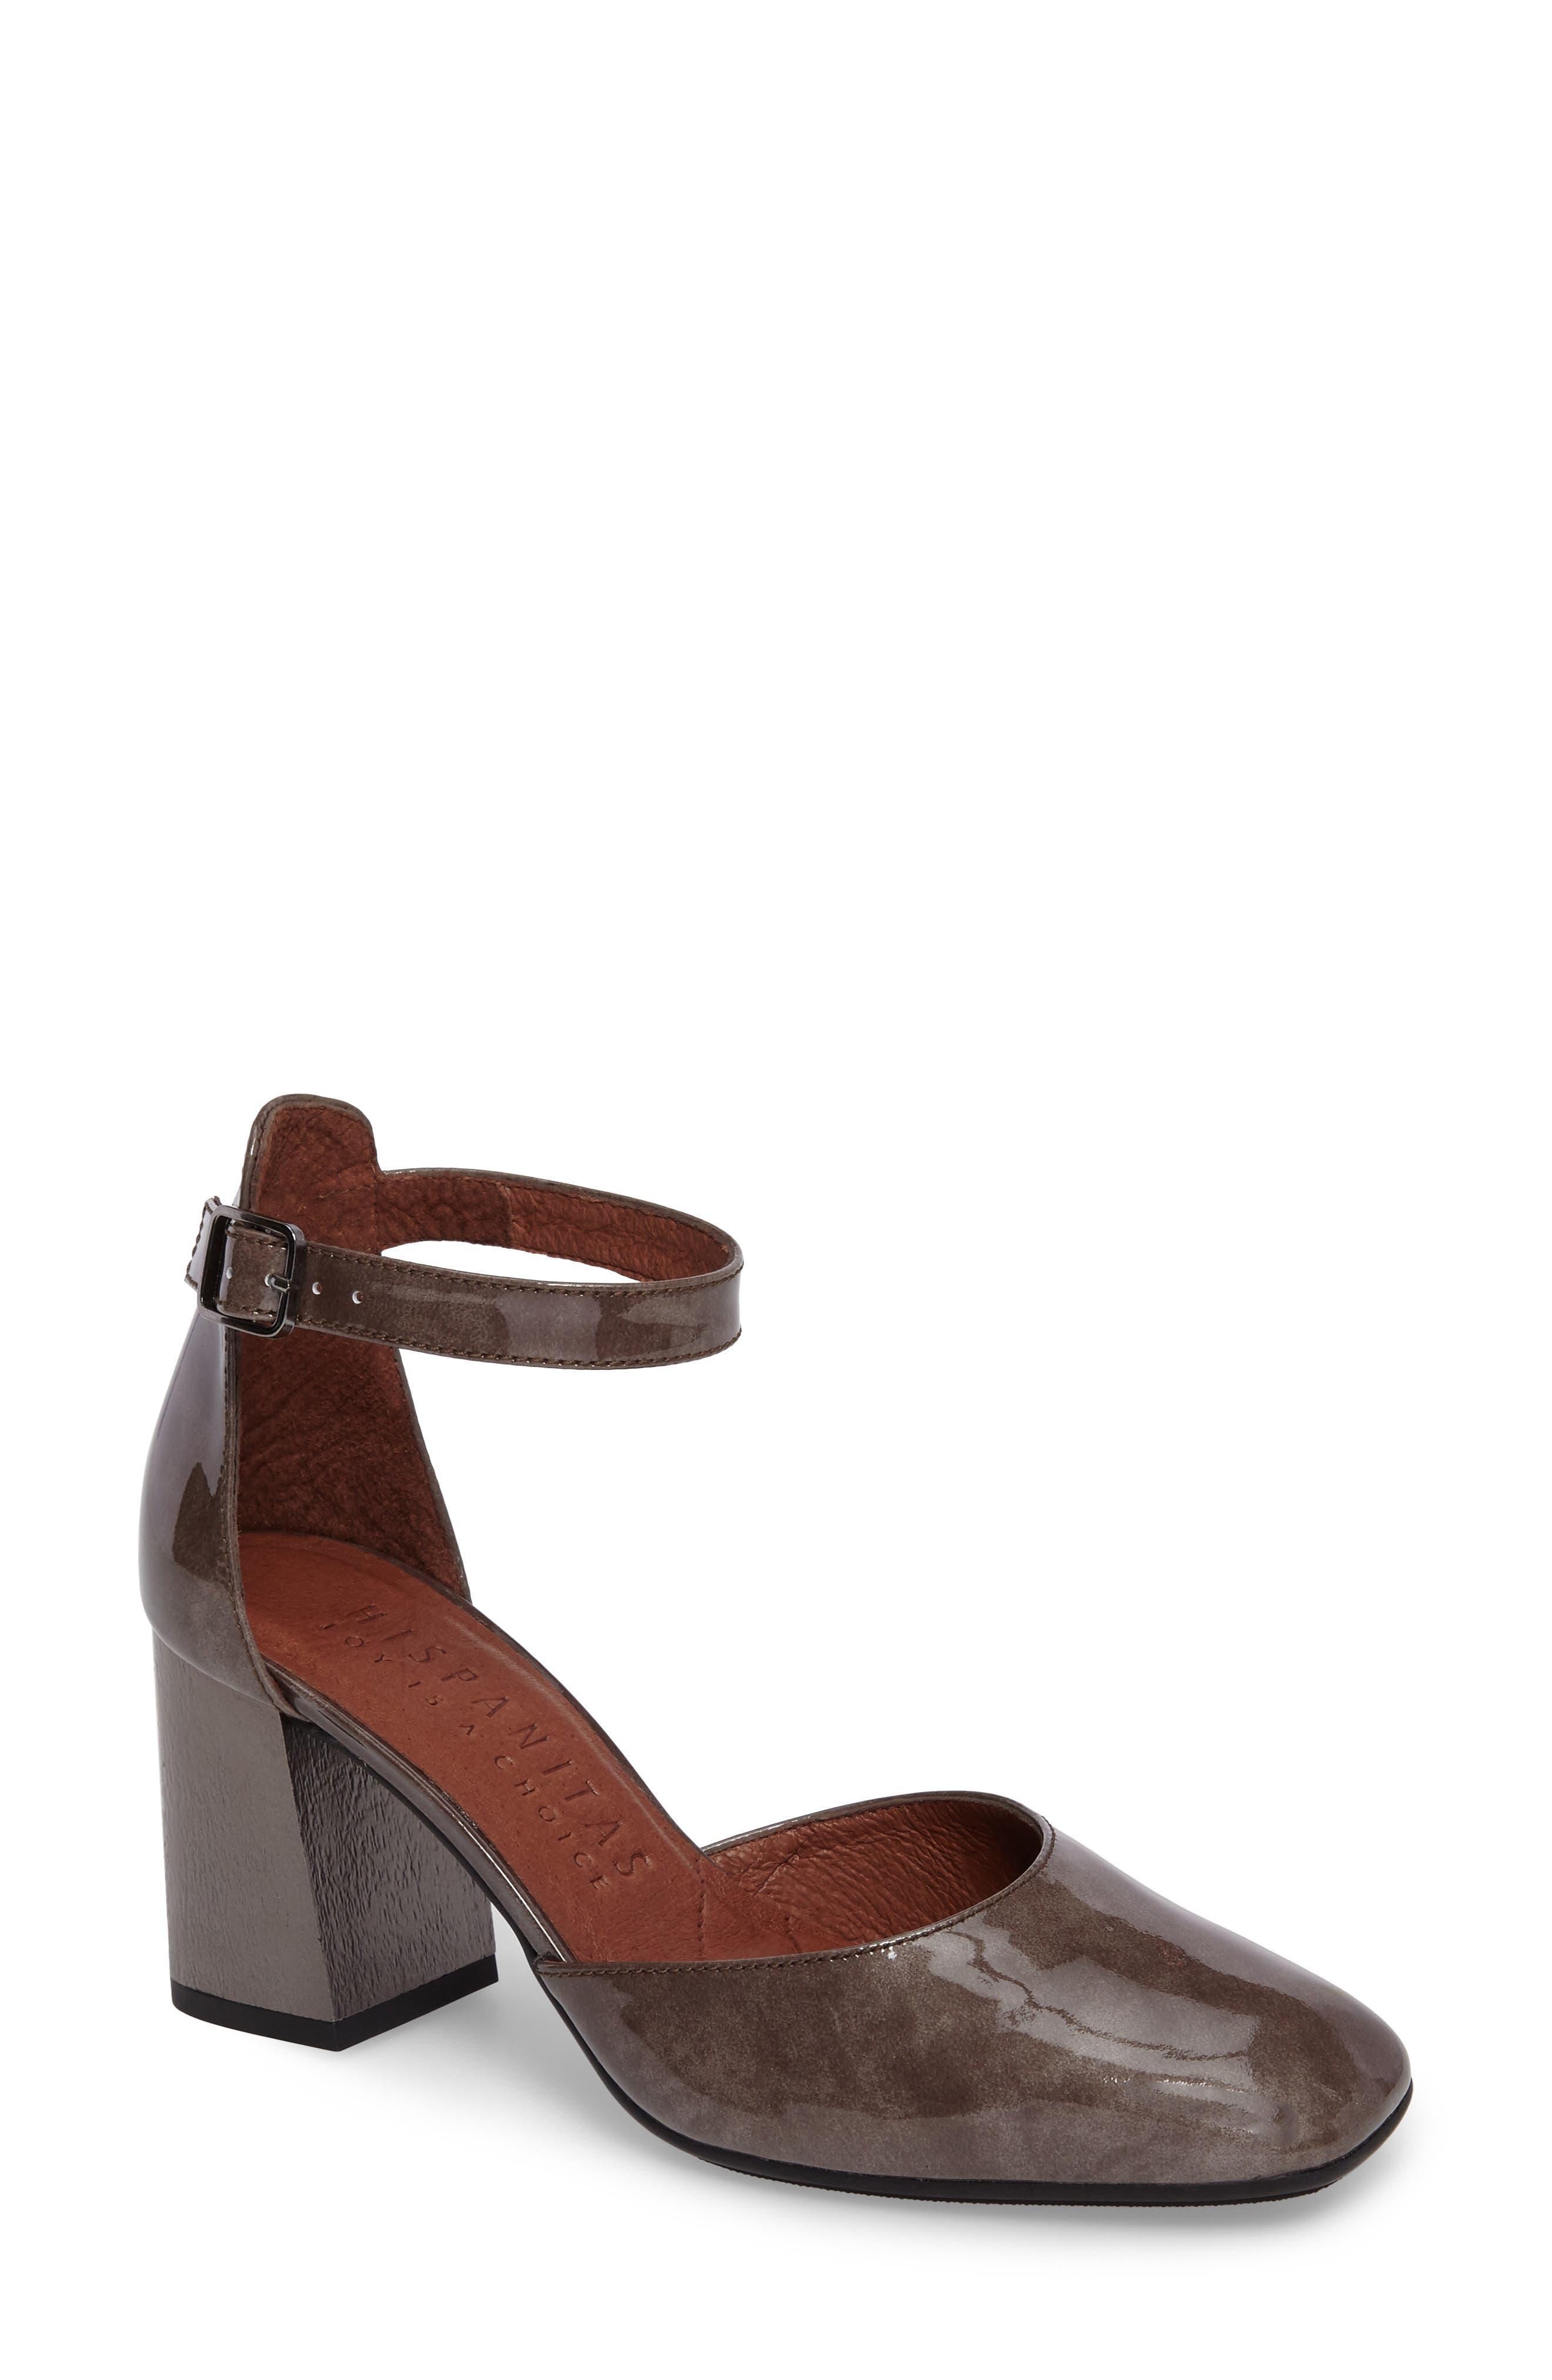 Paulette Flared Heel Pump,                         Main,                         color, Vision Leather